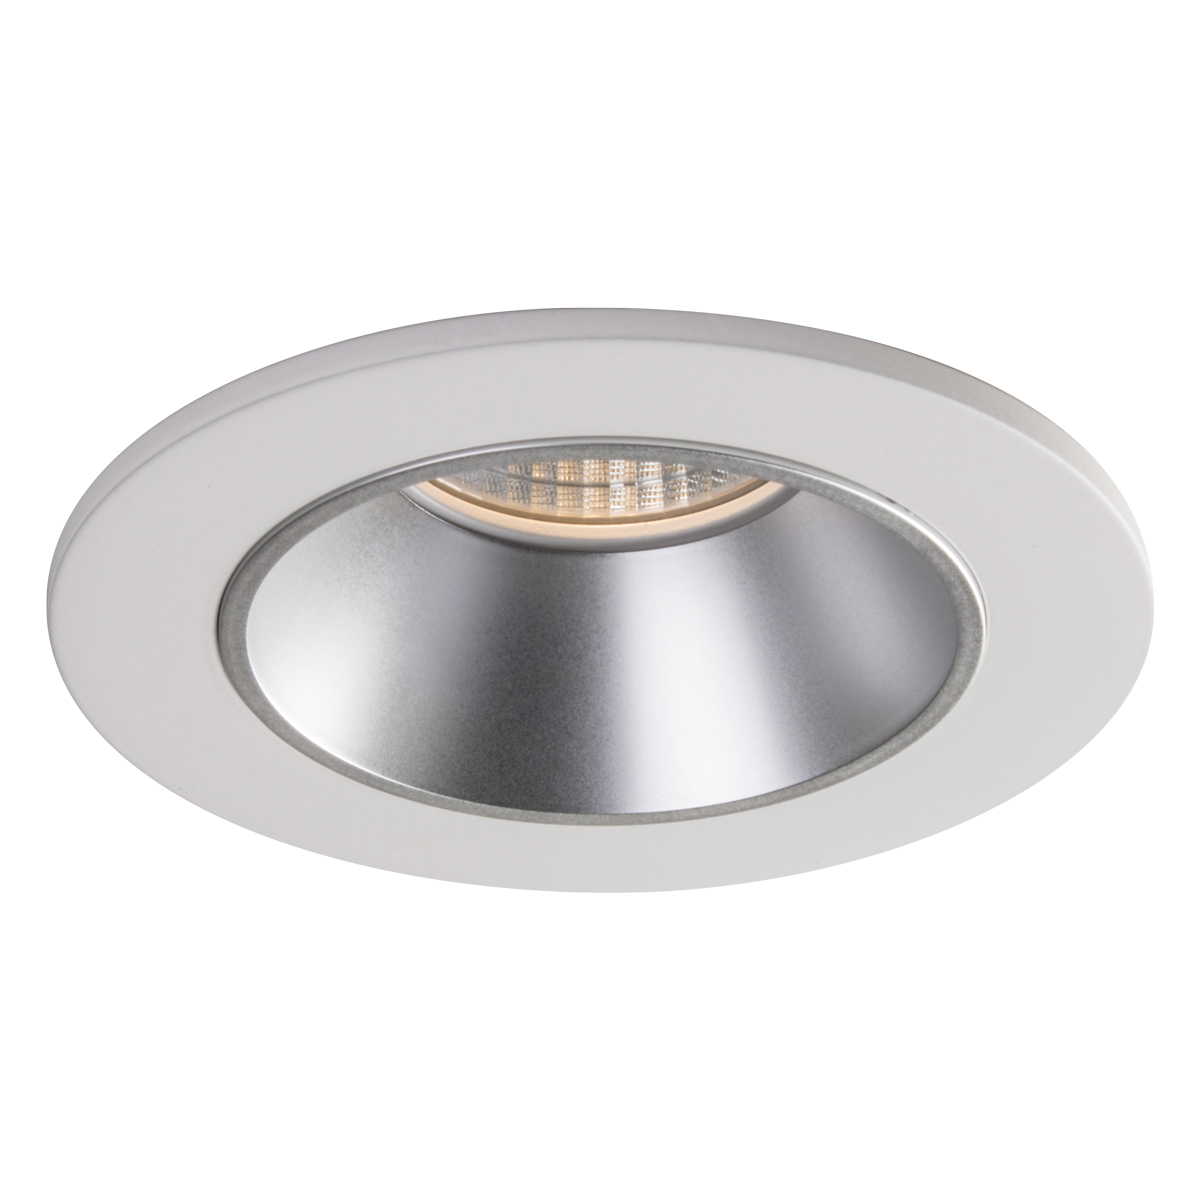 SIGMA 2 Round Deep Regressed LED Fixture